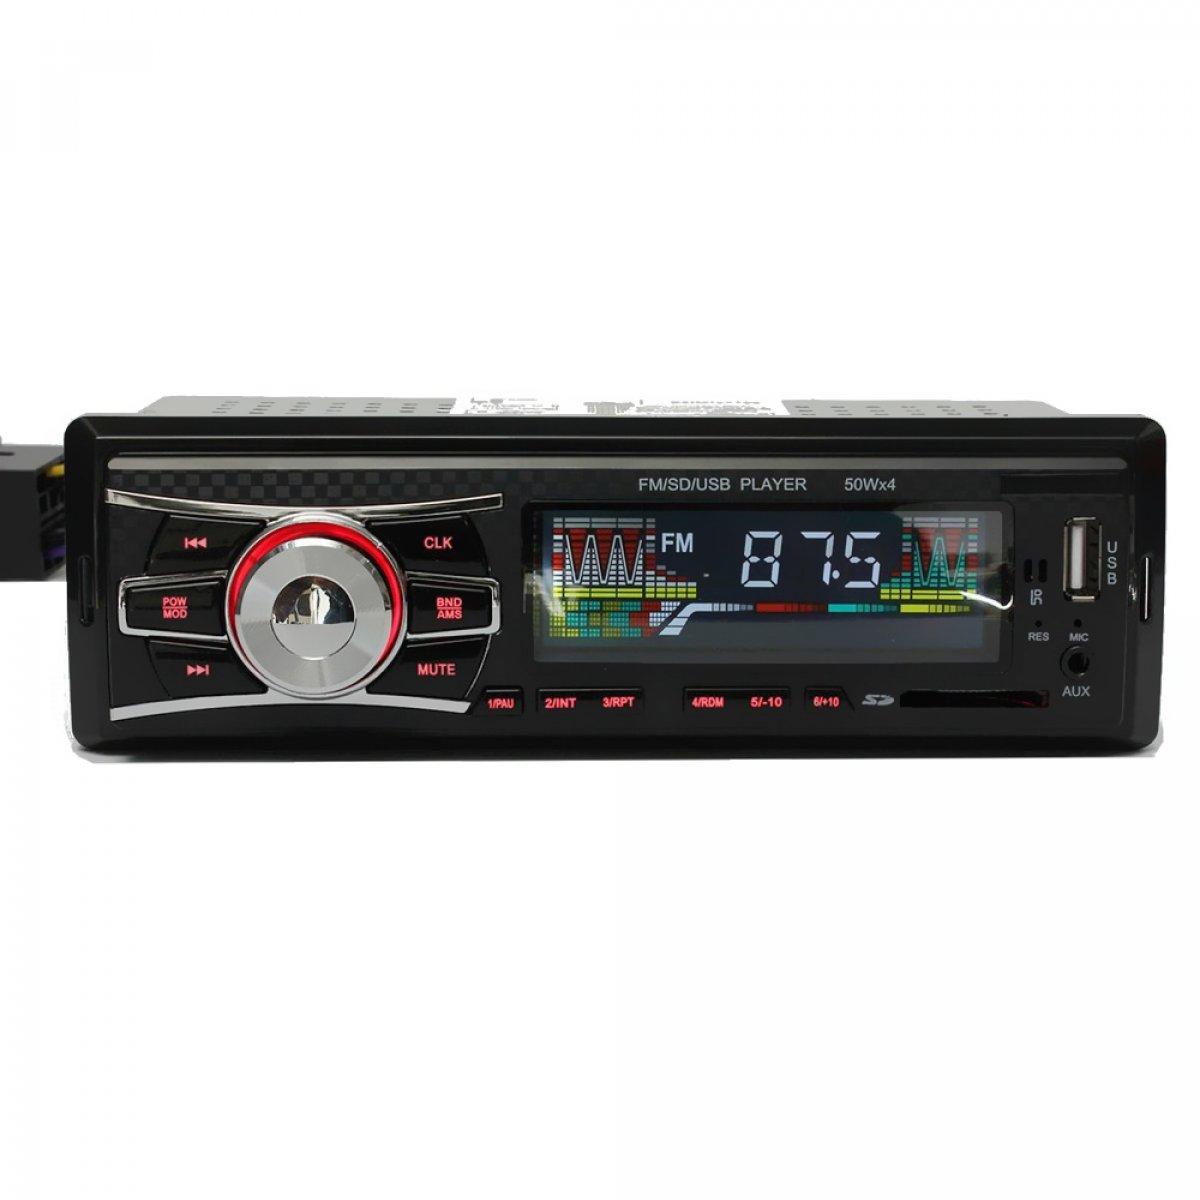 Mp3 player αυτοκινήτου με είσοδο USB/SD/AUX, ραδιόφωνο και χειριστήριο – Carbon 6083